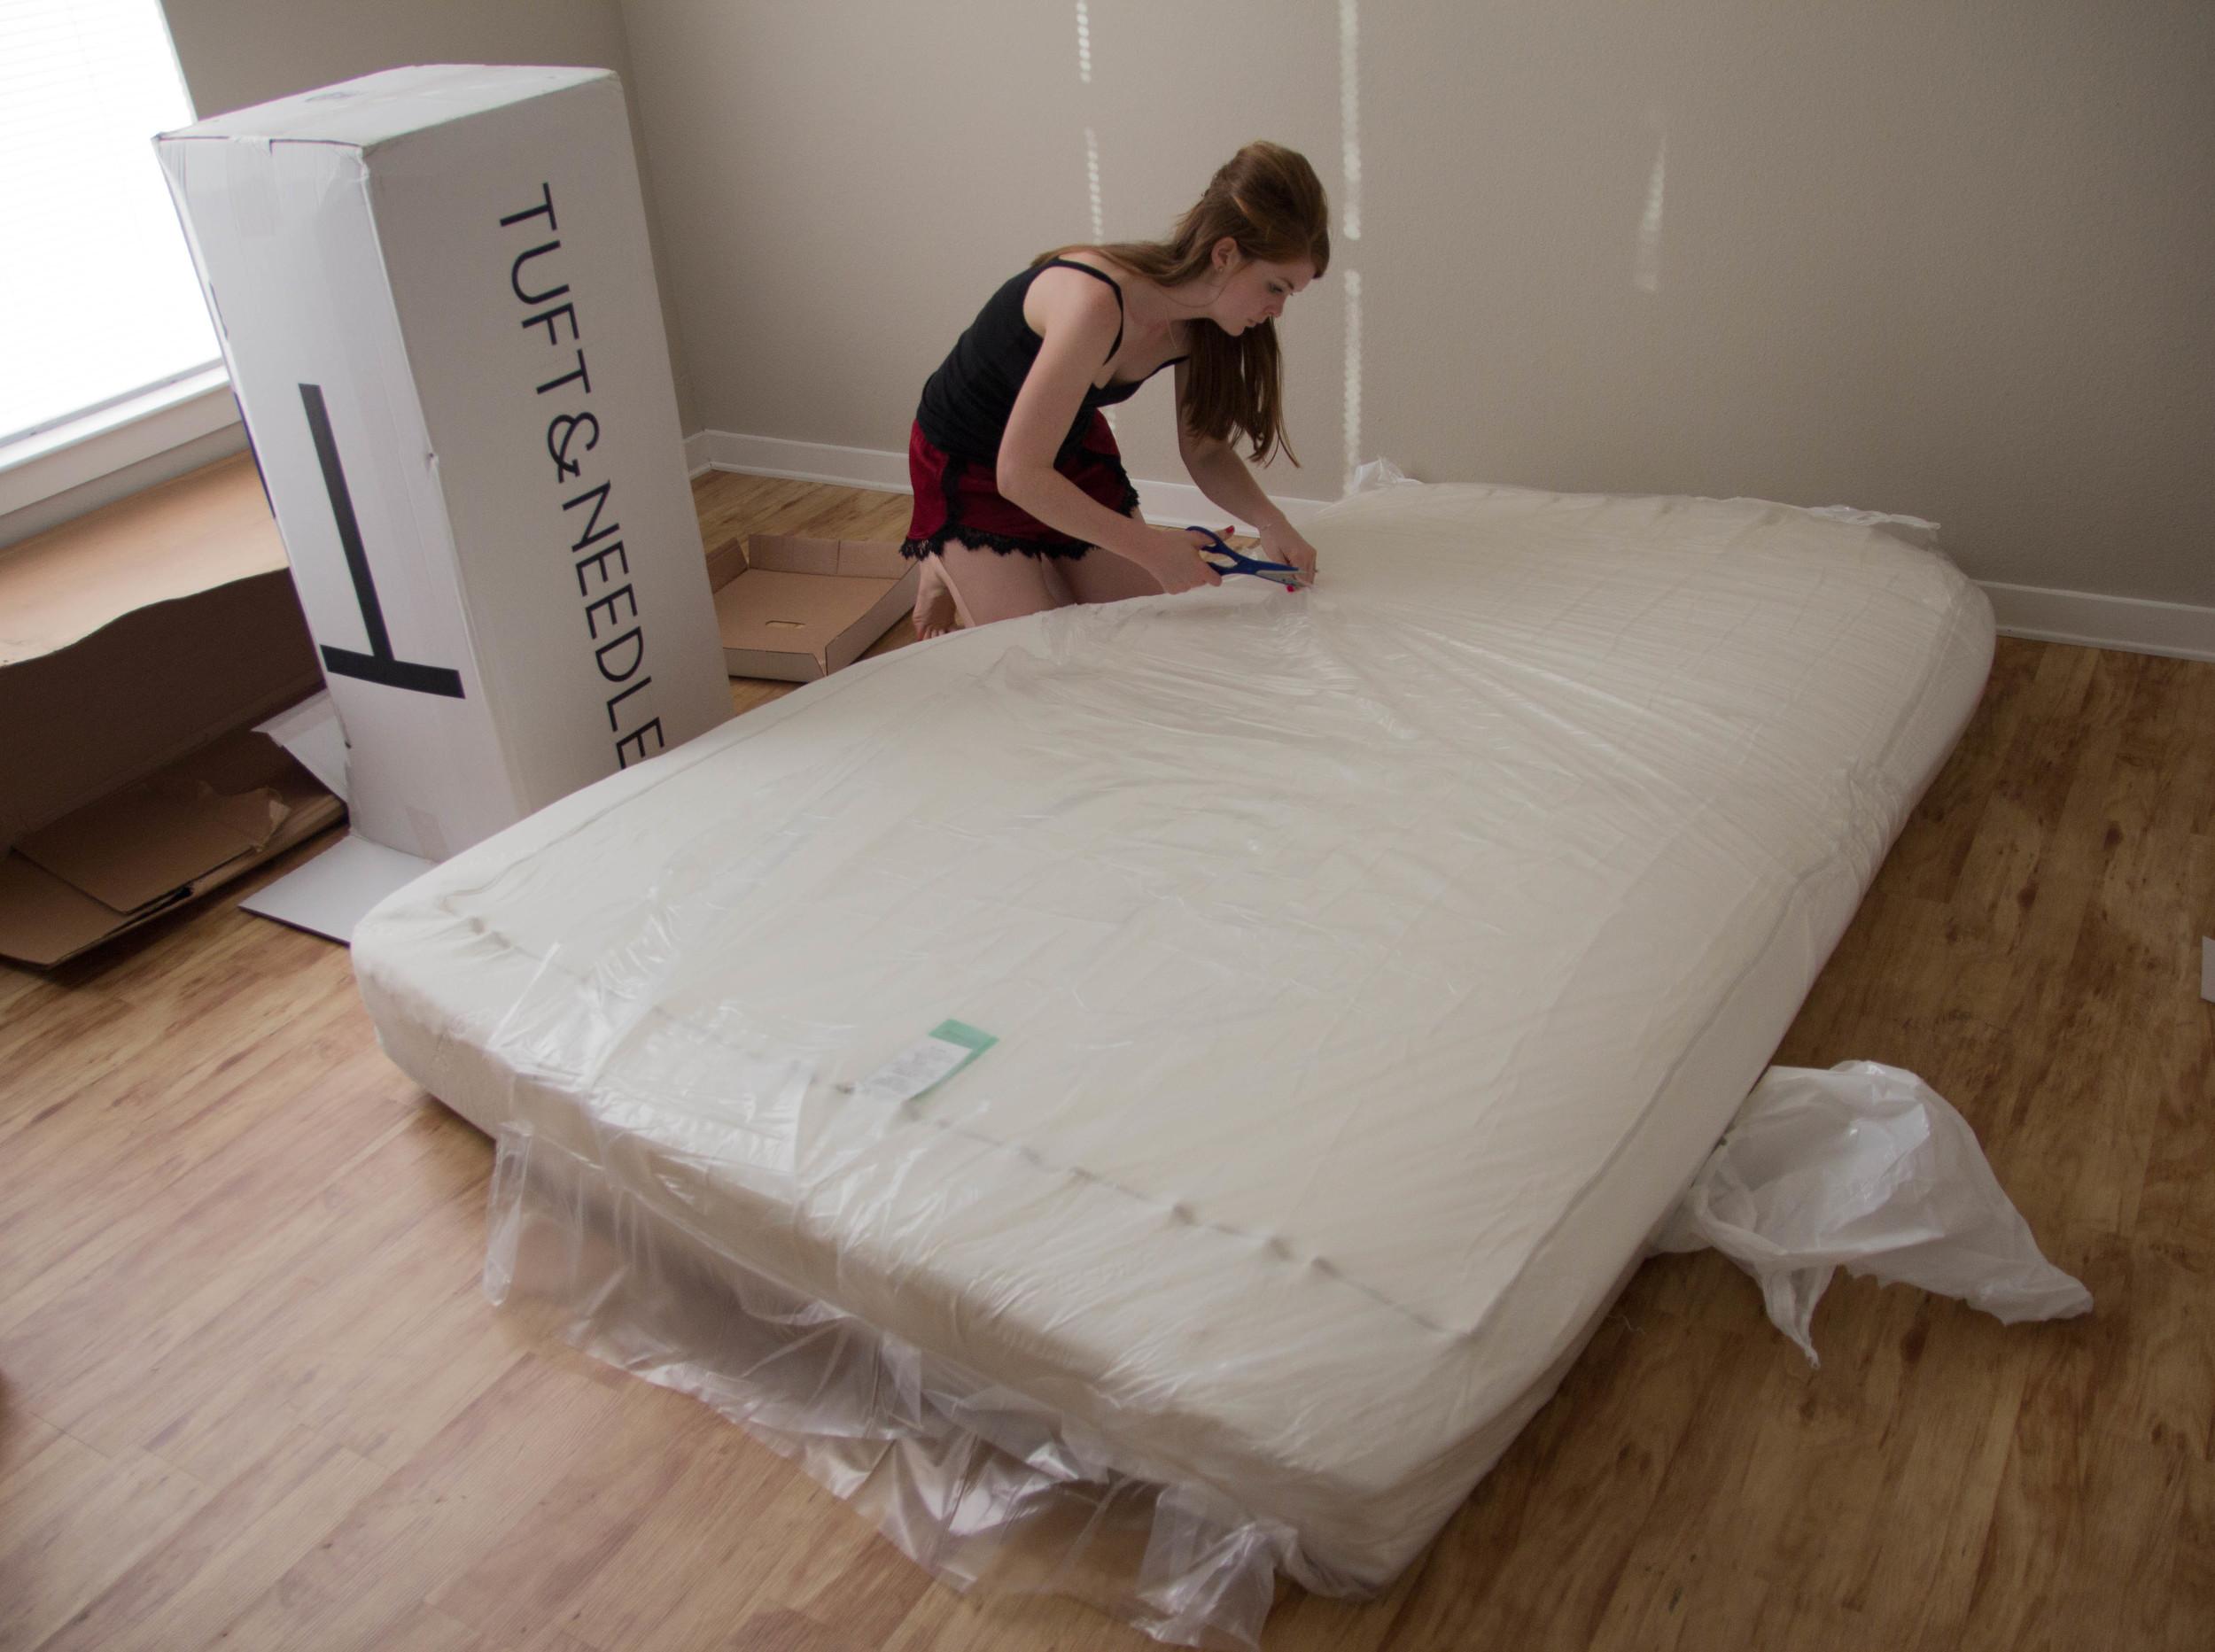 tuft and needle, online mattress company, california king mattress, where to buy a mattress, show me your mumu nori's knickers, j crew perfect fit tank